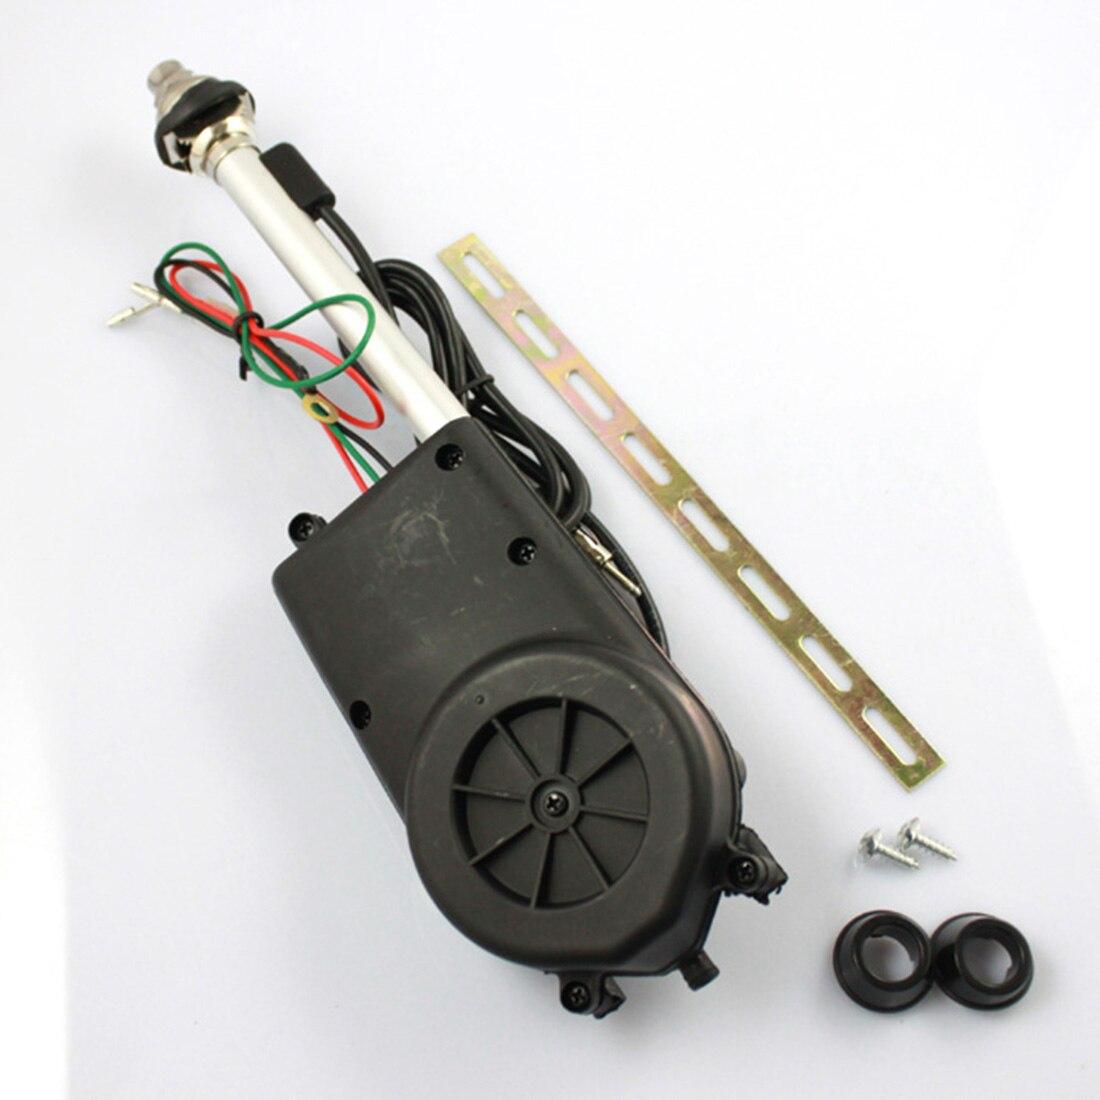 Marsnaska Universal Car Antenna Electric Power Antenna Replacement Kit  Vehicle Am Fm Radio Mast Aerial Car Accessories